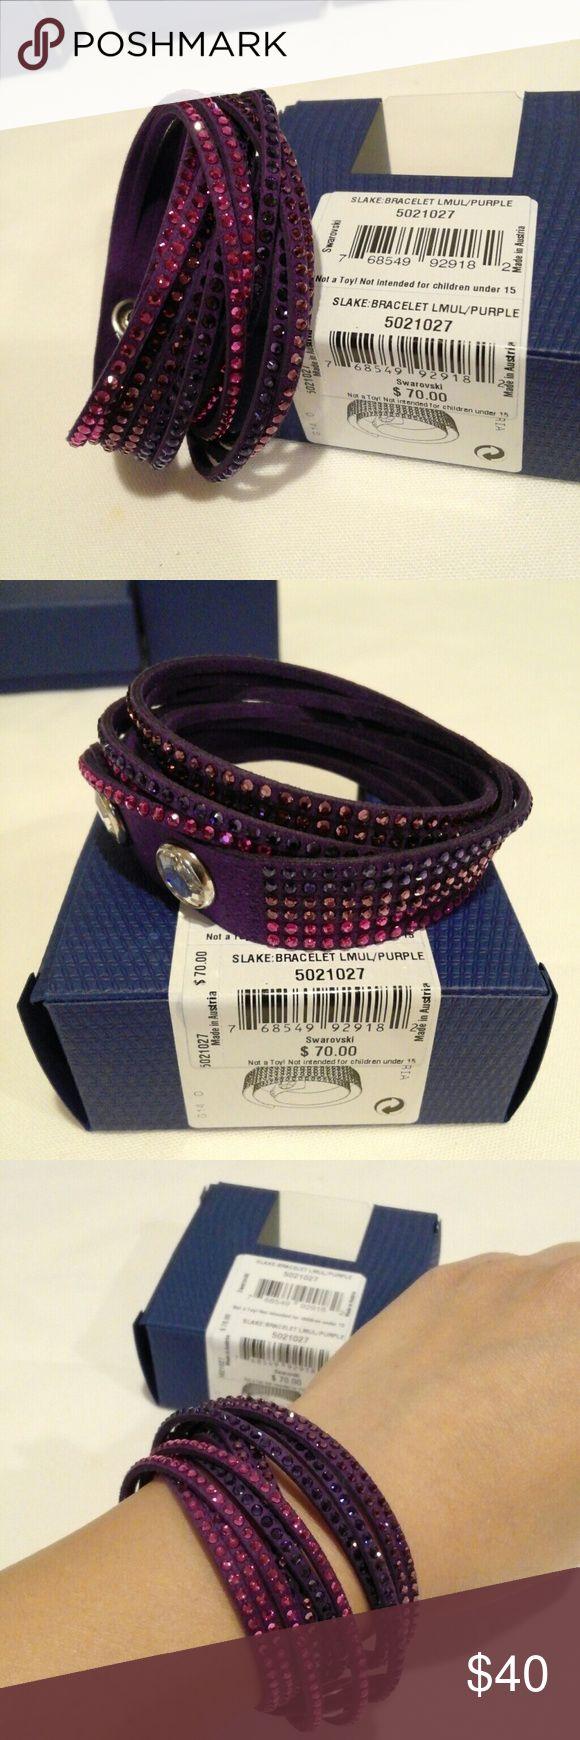 💕 Swarovski Slake: Bracelet LMUL/Purple. 5021027 New! Swarovski Slake: Bracelet LMUL/Purple. 5021027 🚫NO trade 🚫 Thanks for looking ❤ Swarovski  Jewelry Bracelets